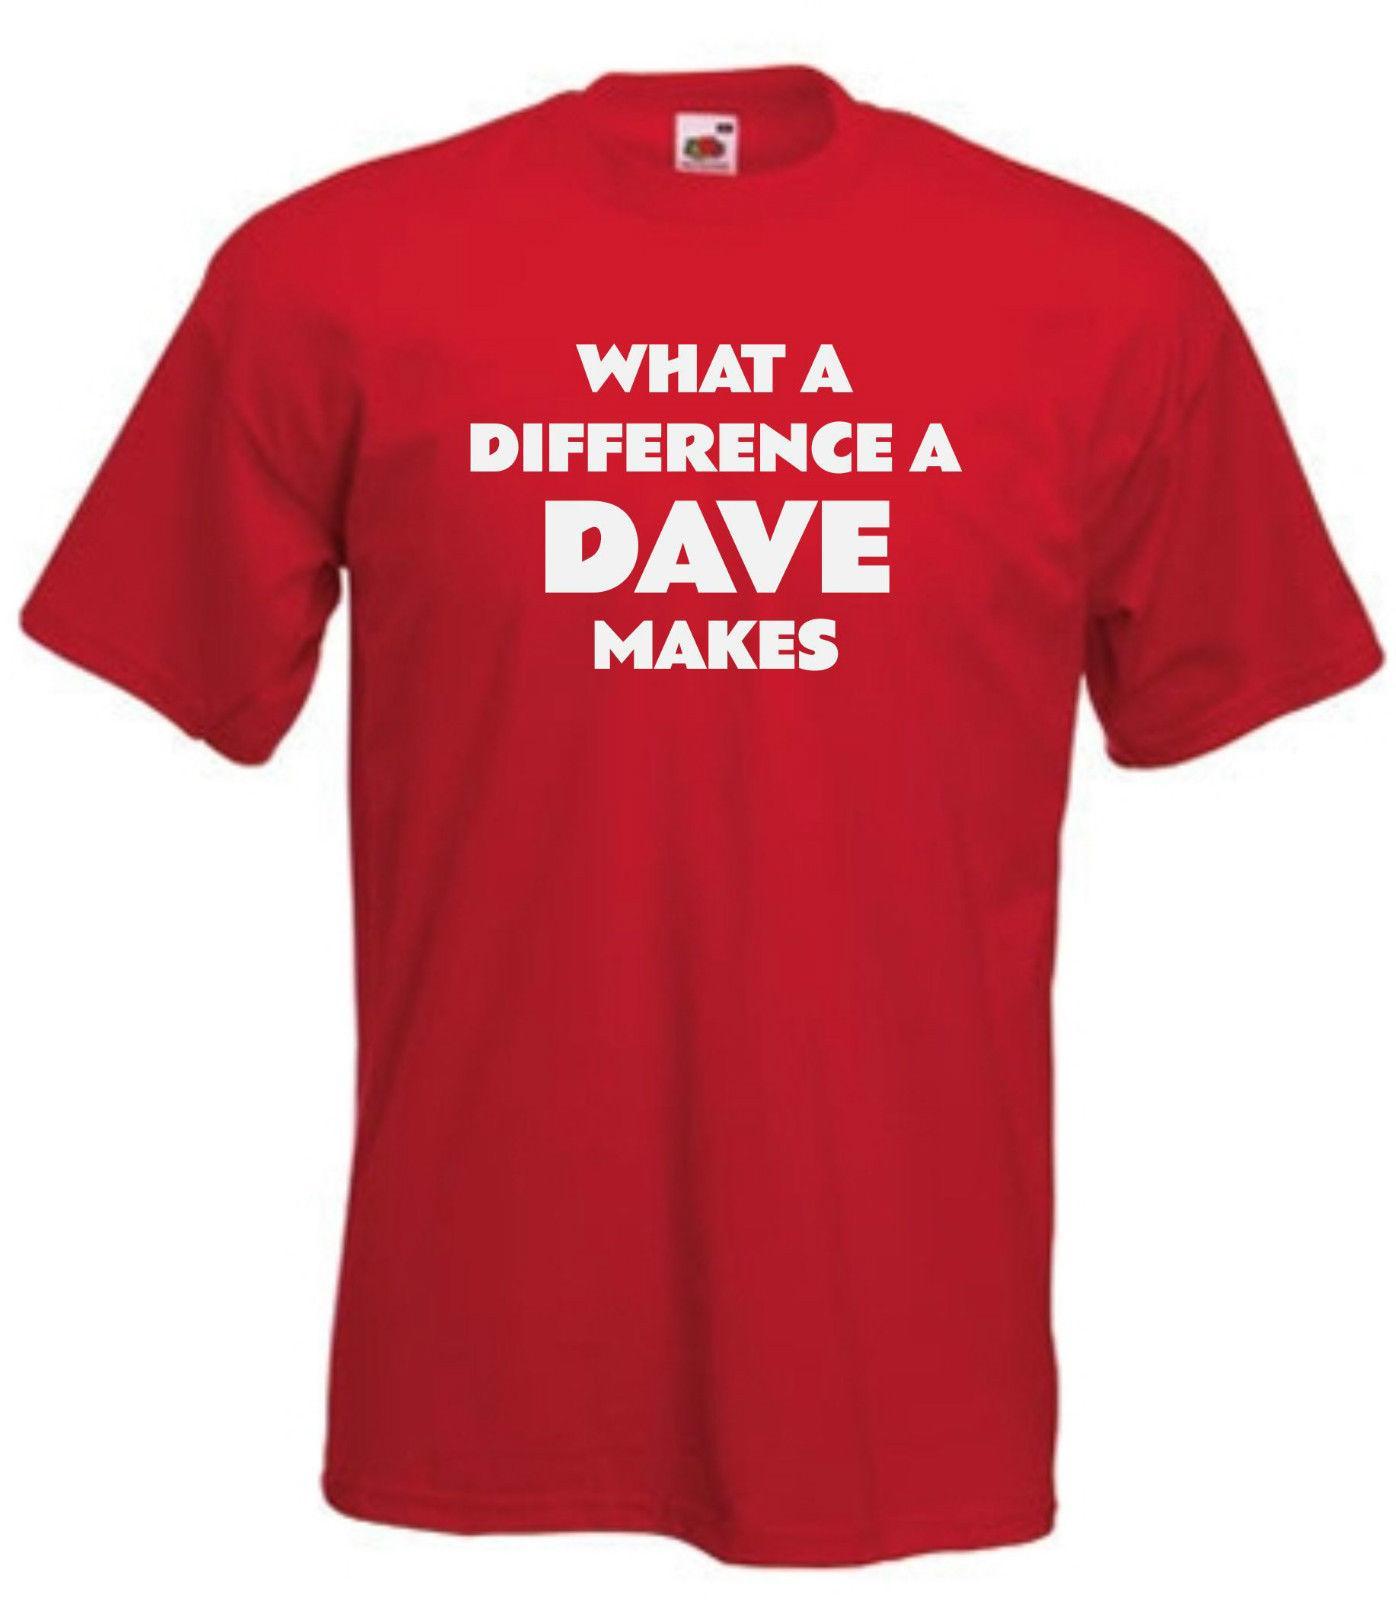 36bee2e75 DAVE T SHIRT FUNNY TSHIRT JOKE T SHIRT SIZES S XXL Tee Shirts Sale  Designable T Shirts From Tshirtbuzz, $11.01  DHgate.Com